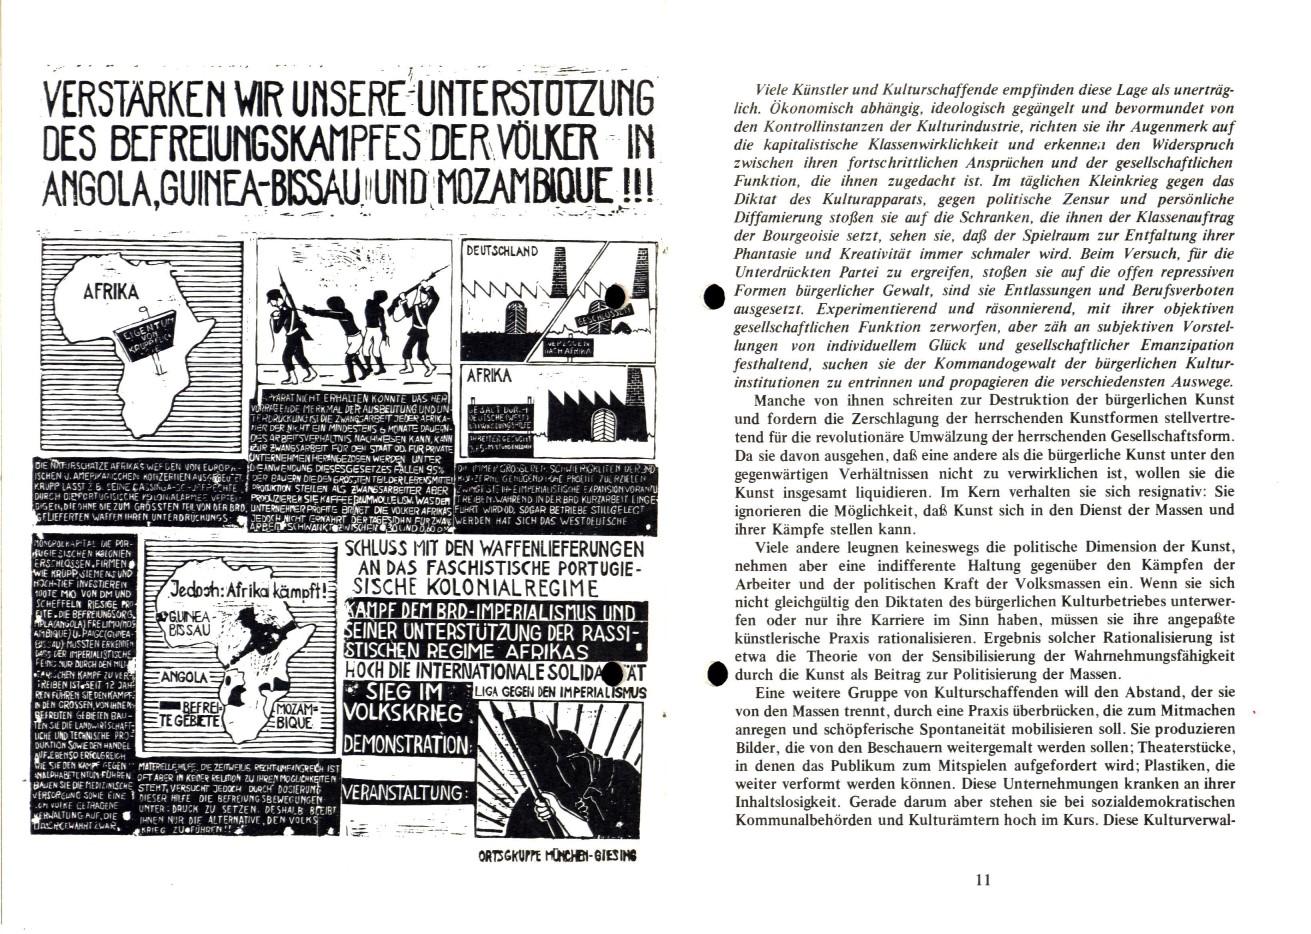 VSK_1974_Manifest_07